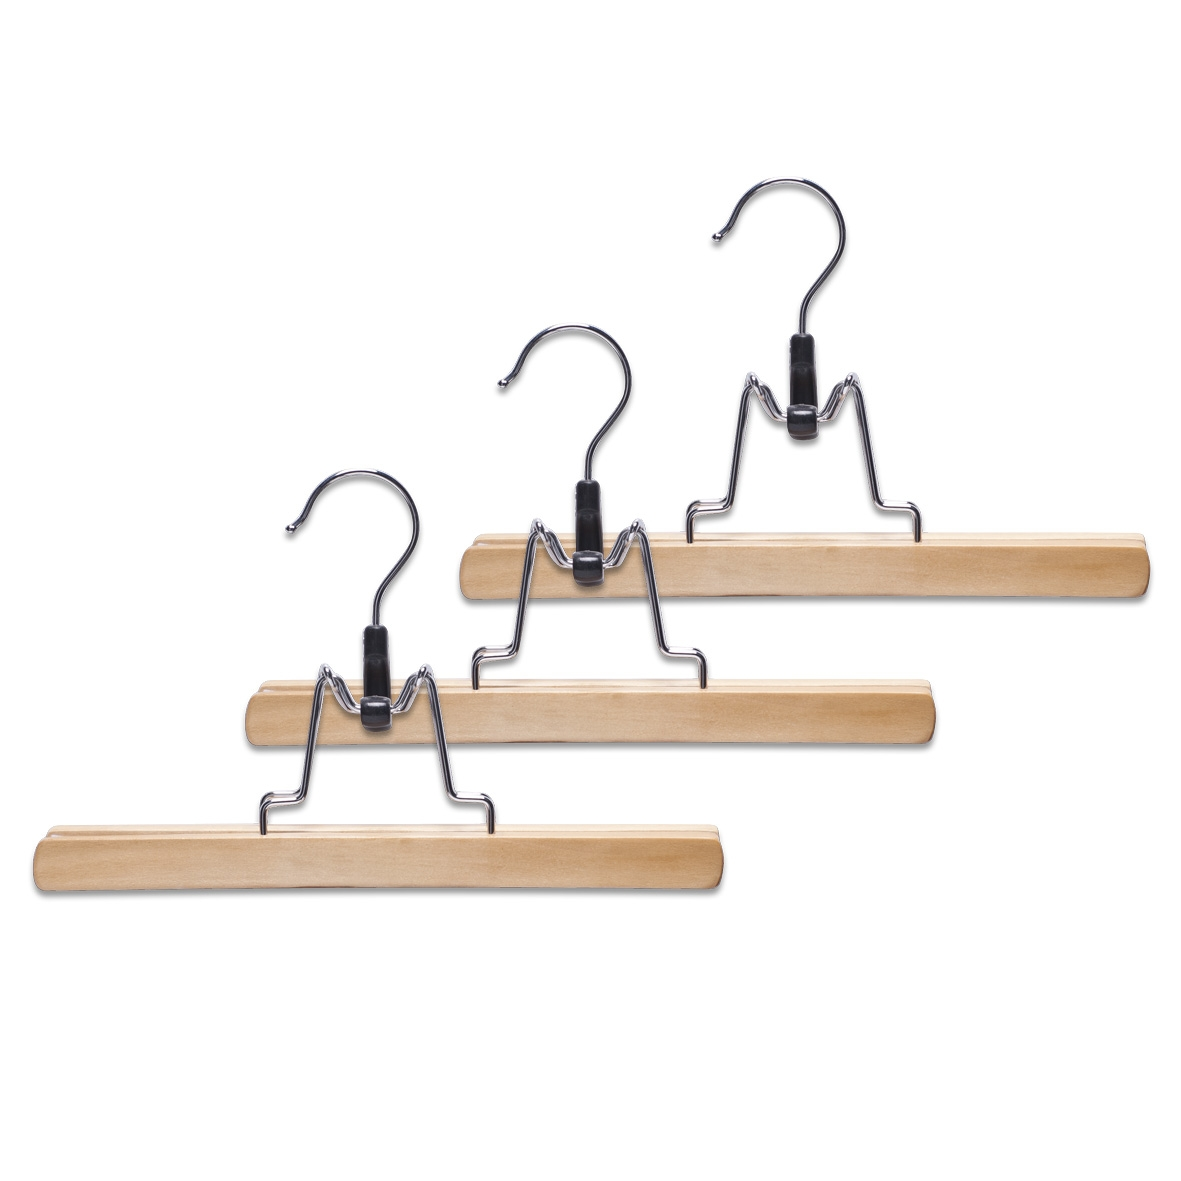 Set umerase din metal si lemn pentru pantaloni, Belt Natural, l25xH15 cm, 3 bucati imagine